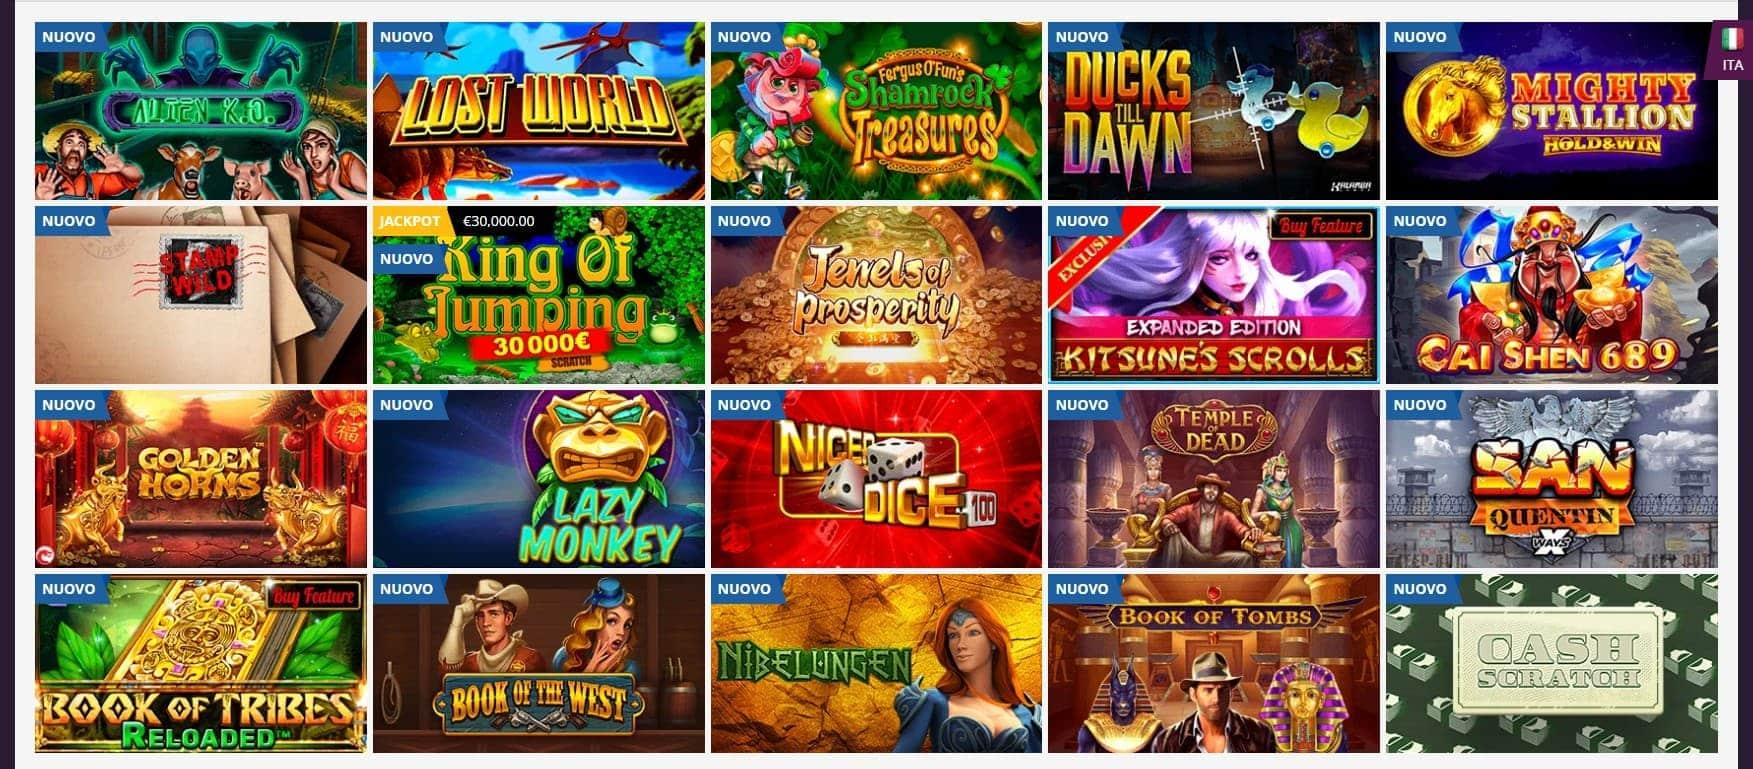 Giochi Playamo Casino